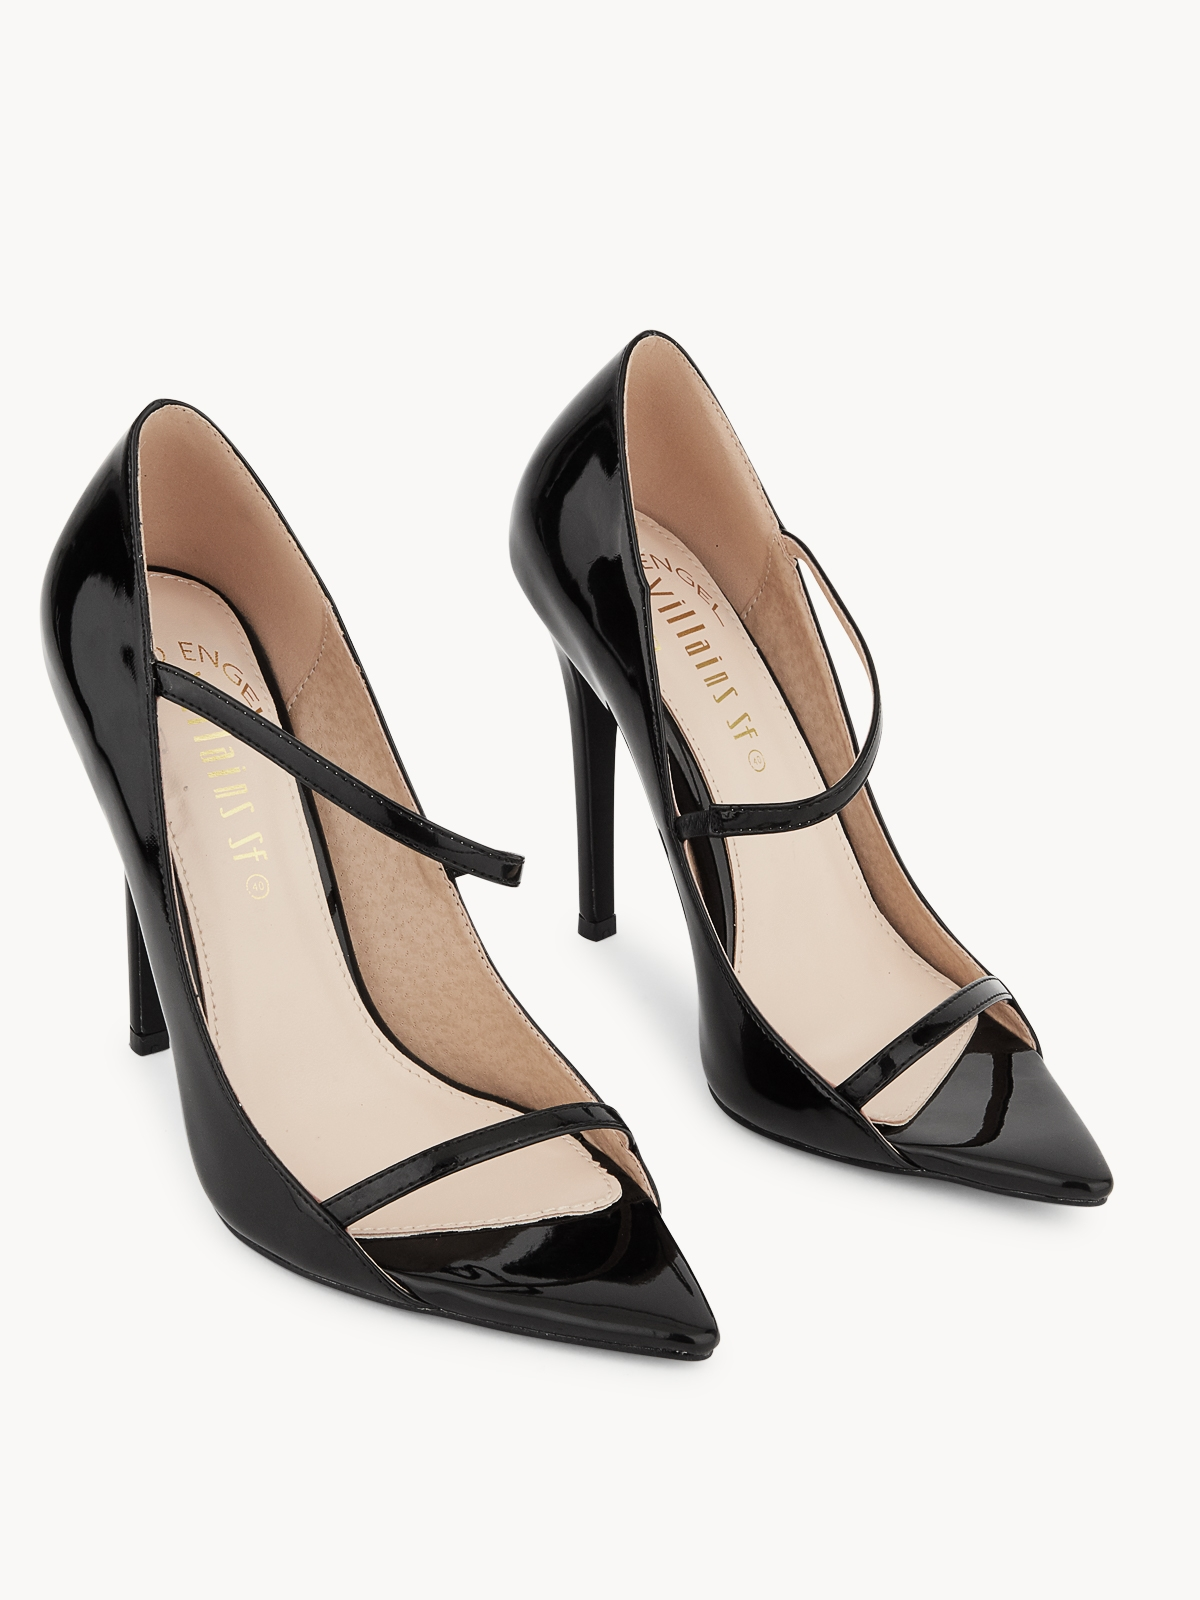 Villains SF Indira Open Toe Pump Heels Black